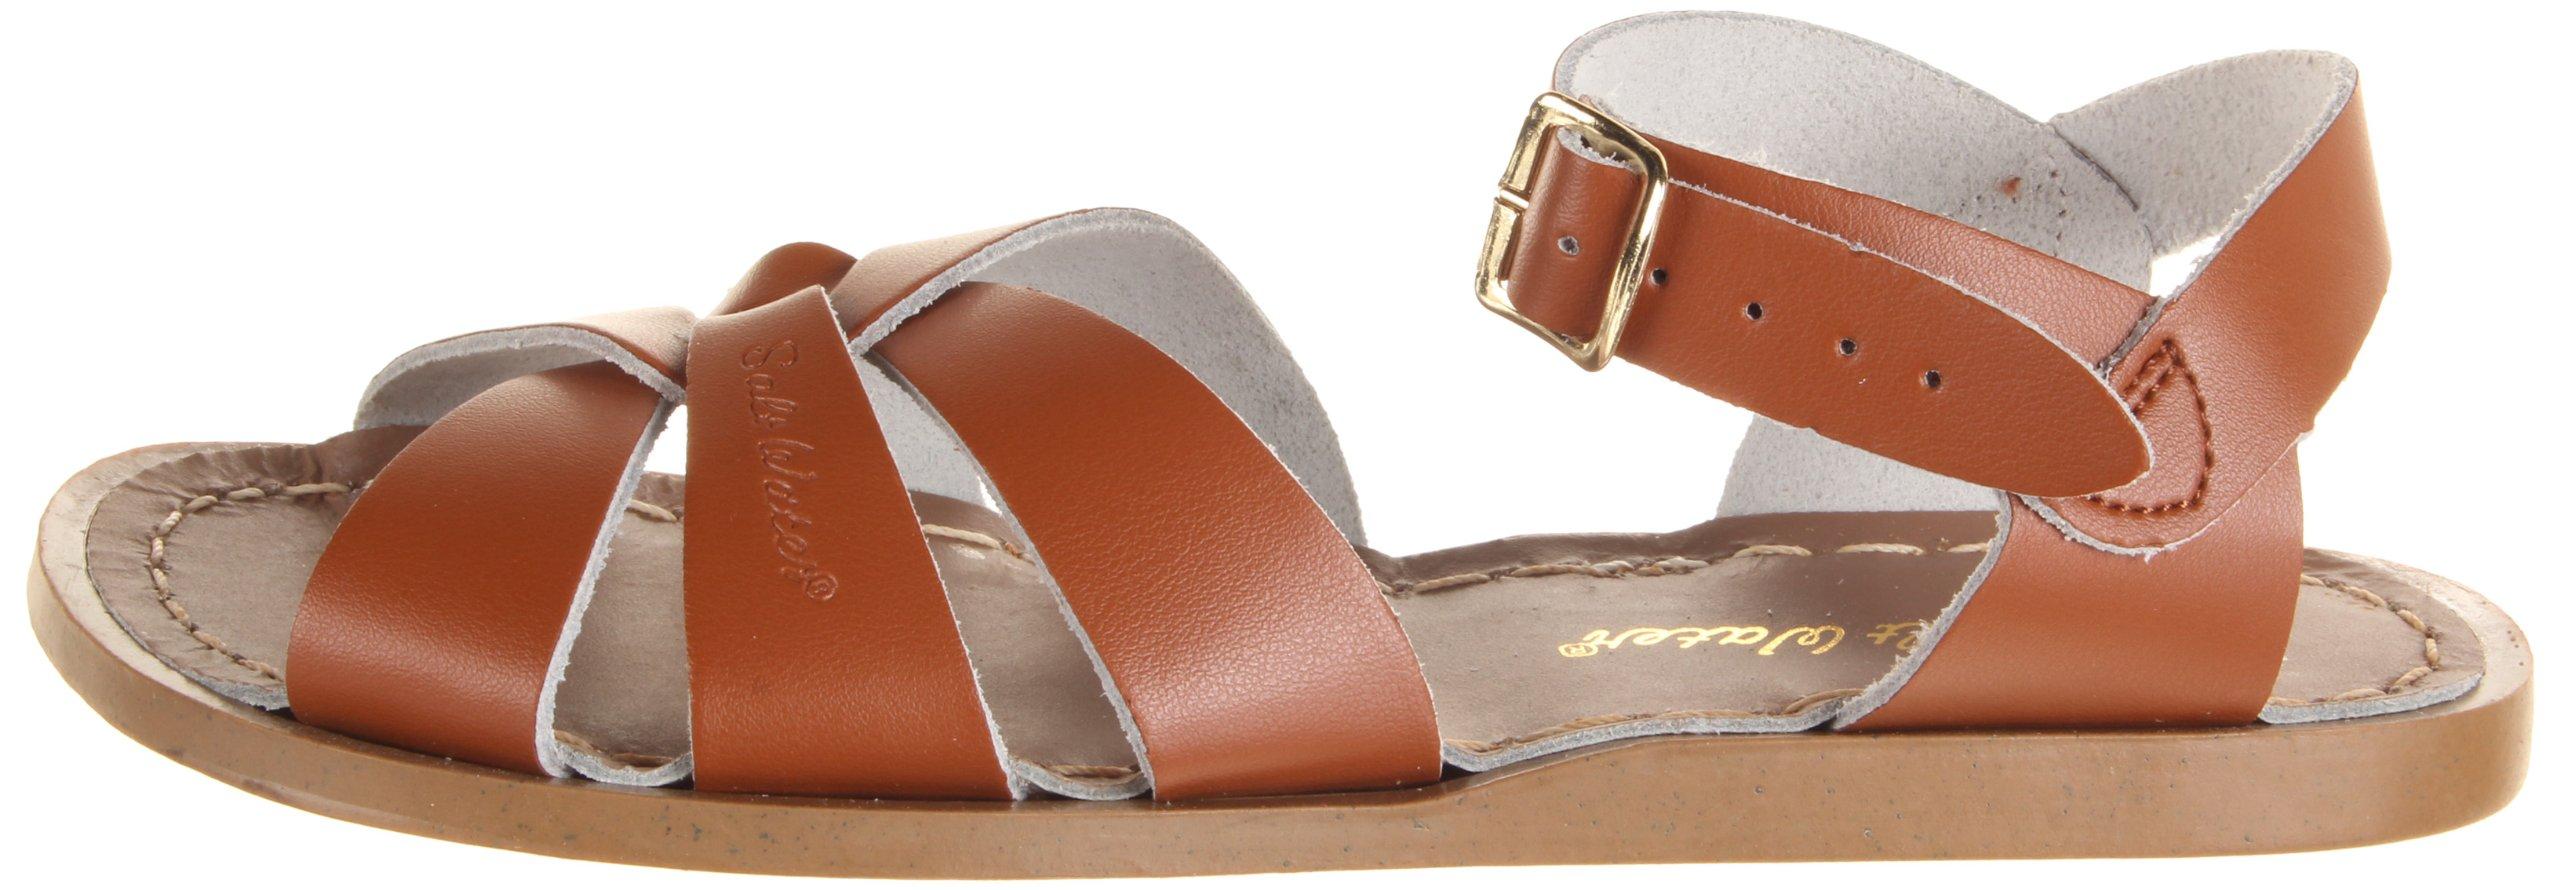 Salt Water Sandals by Hoy Shoe Original Sandal (Toddler/Little Kid/Big Kid/Women's), Tan, 7 M US Big Kid by Salt Water Sandals (Image #5)